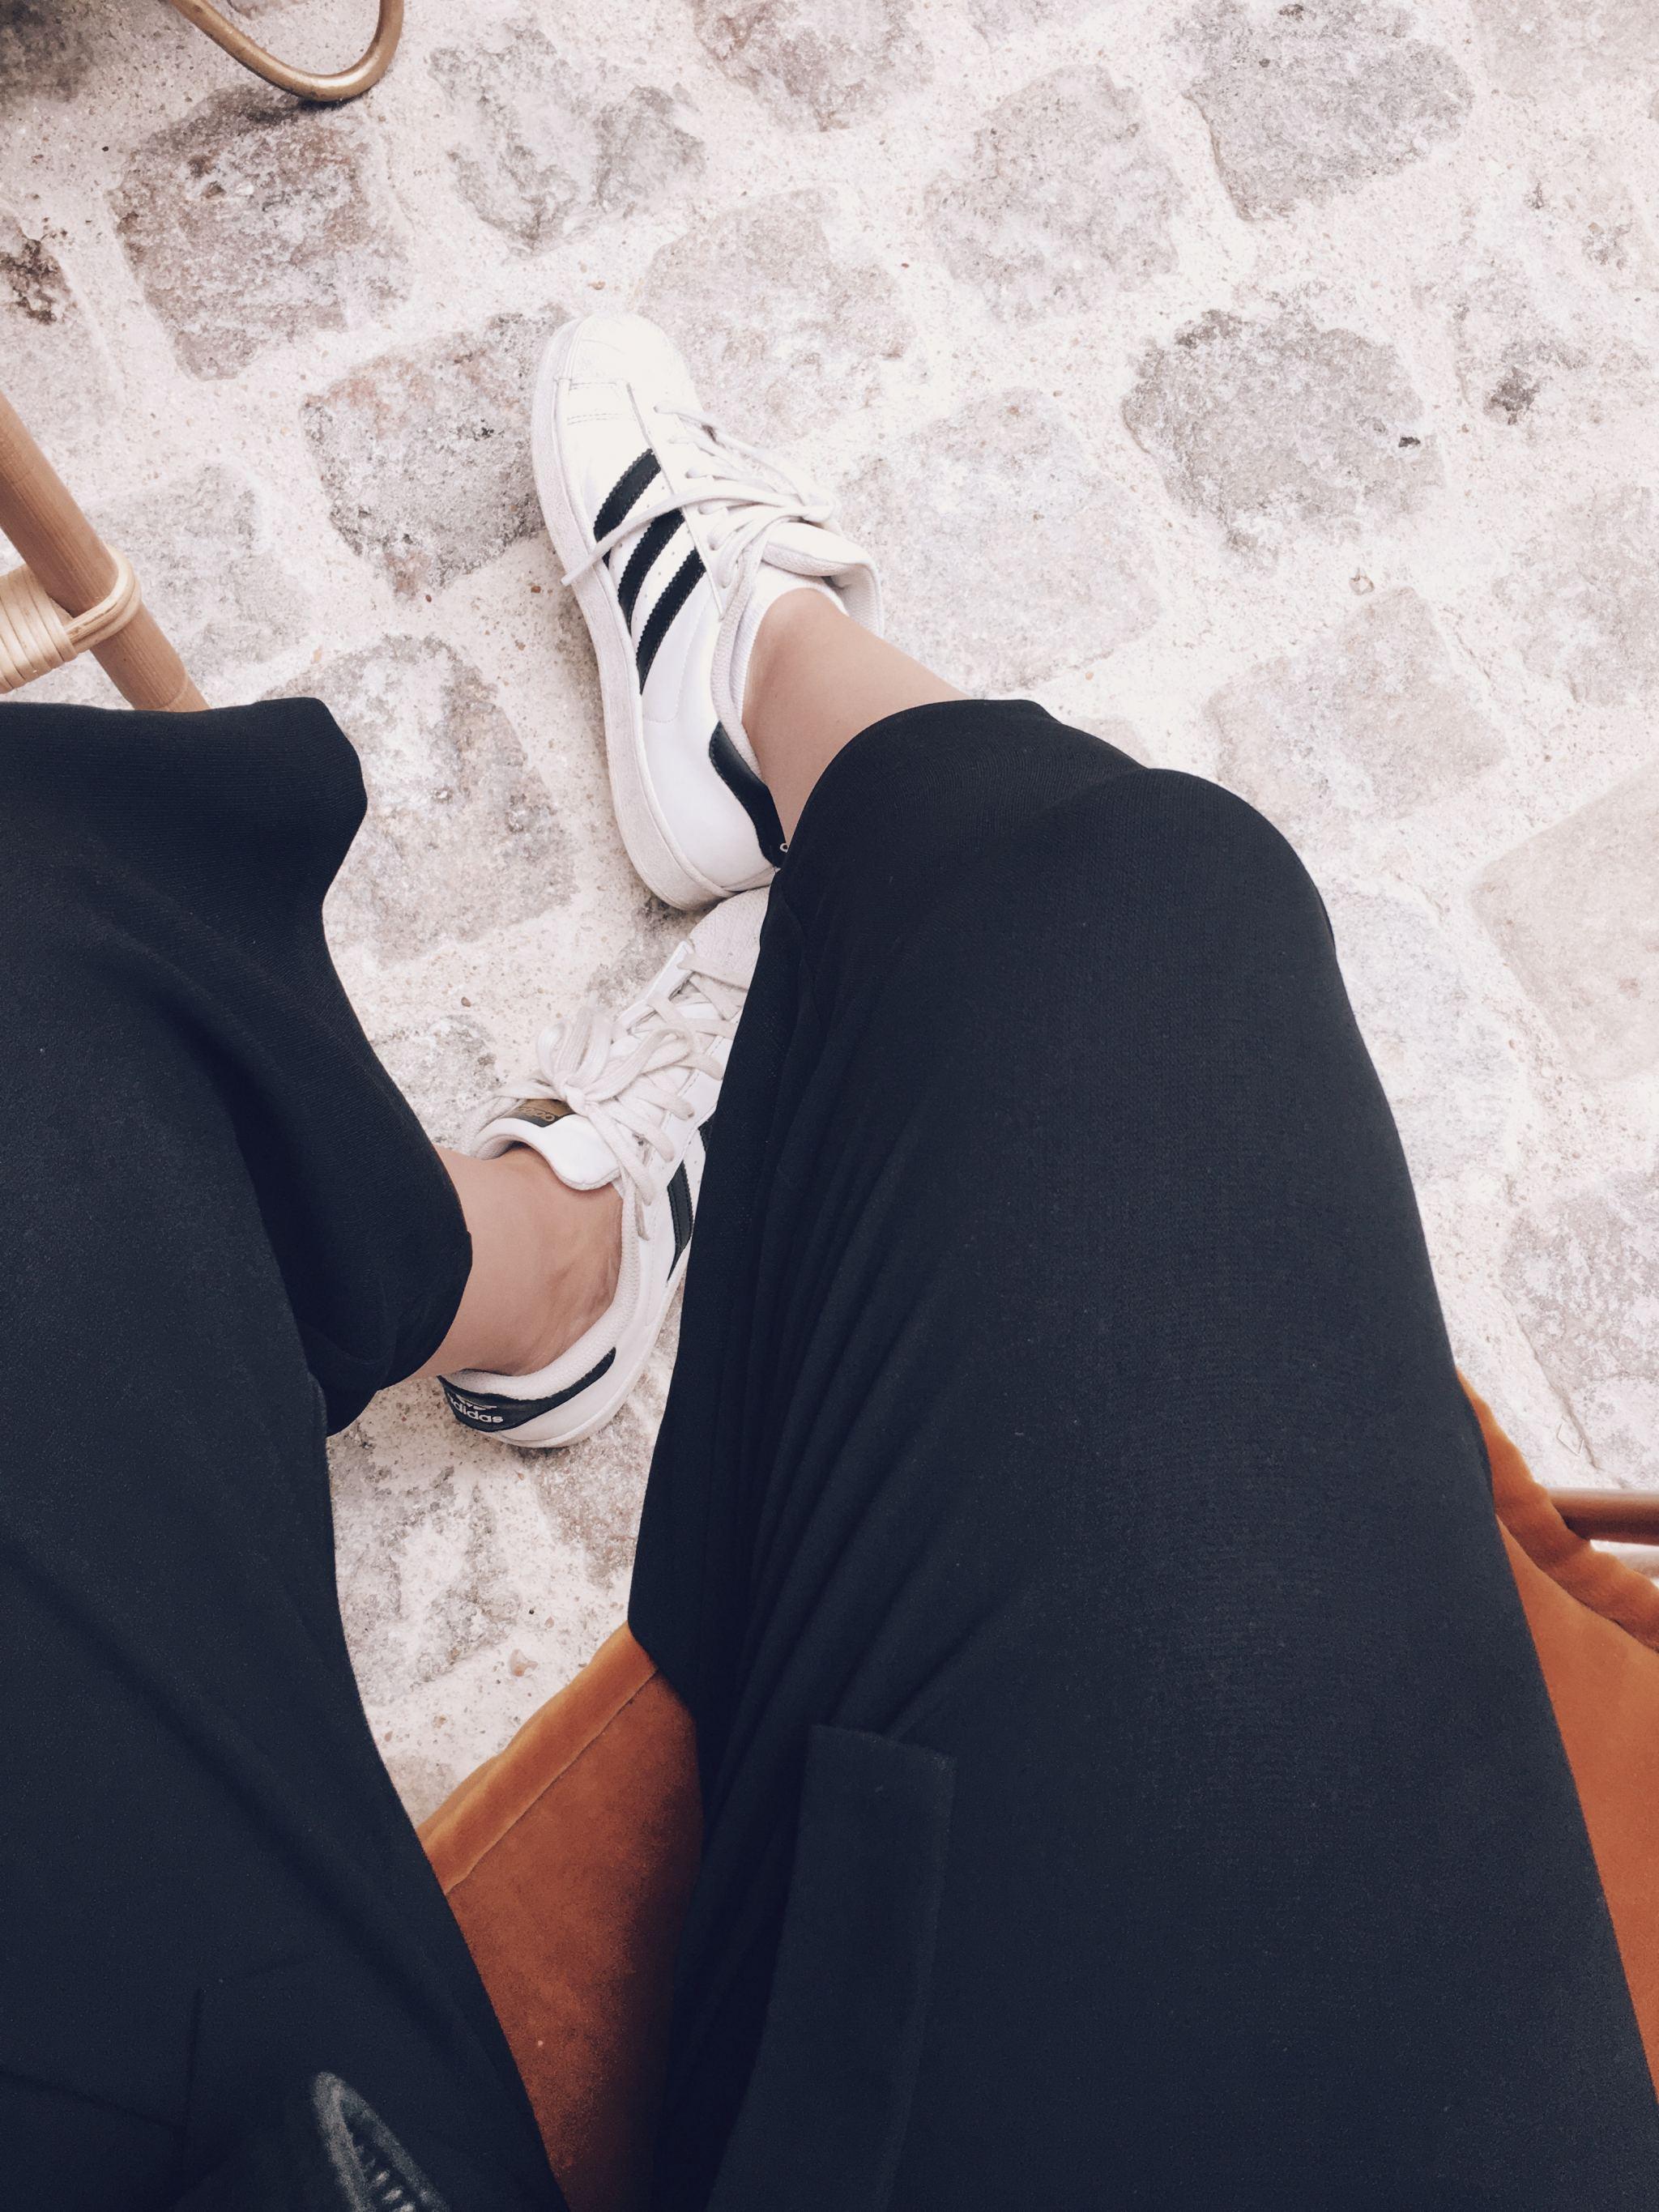 COCOA CHELSEA paris wallis hoxton floor fwis shoes